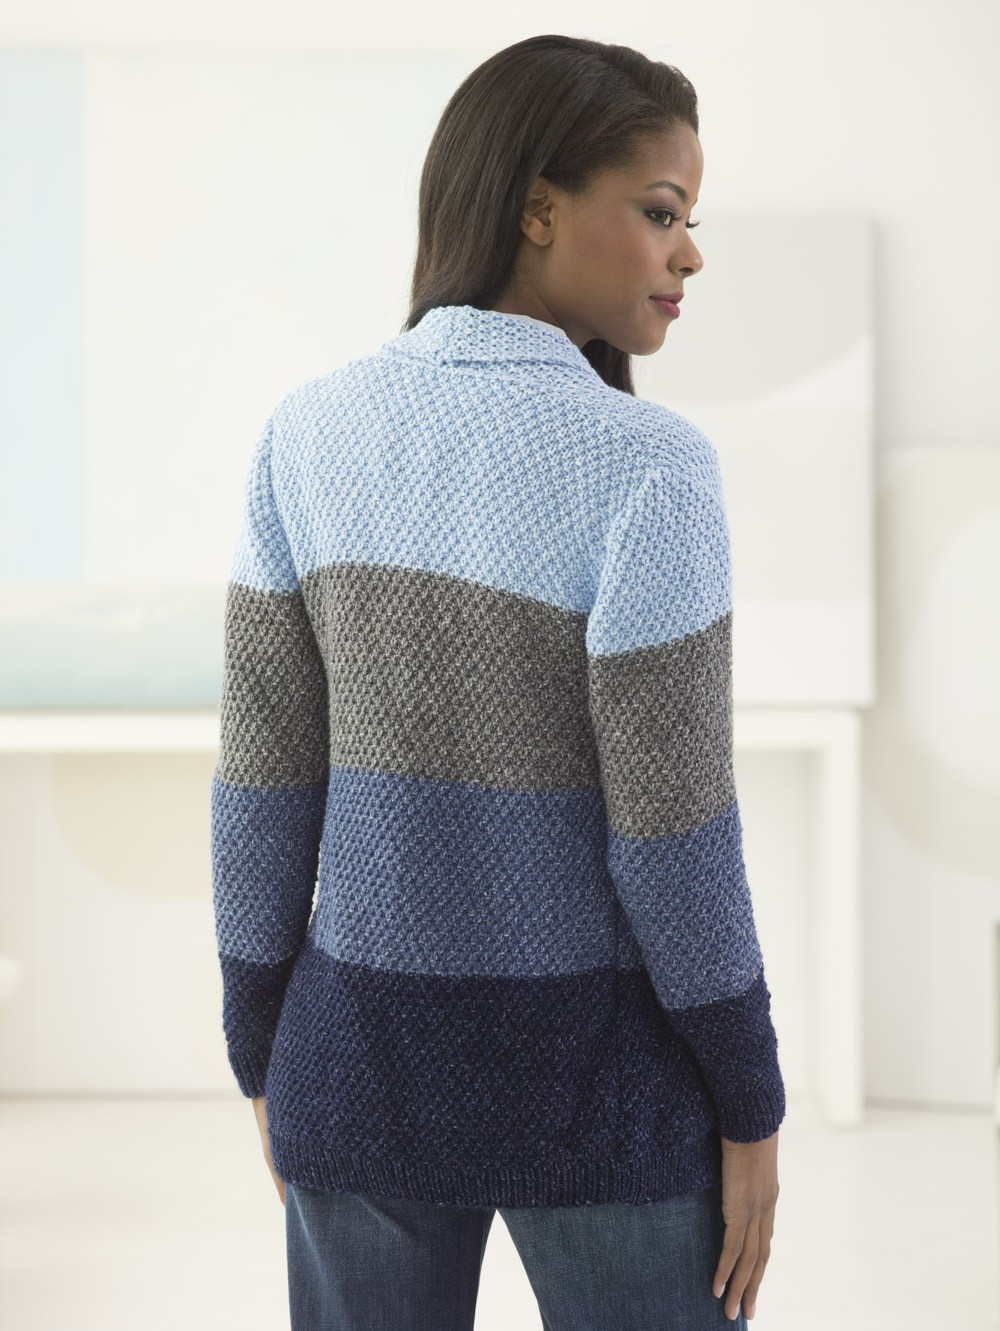 High Plains Cardigan Free Knitting Pattern